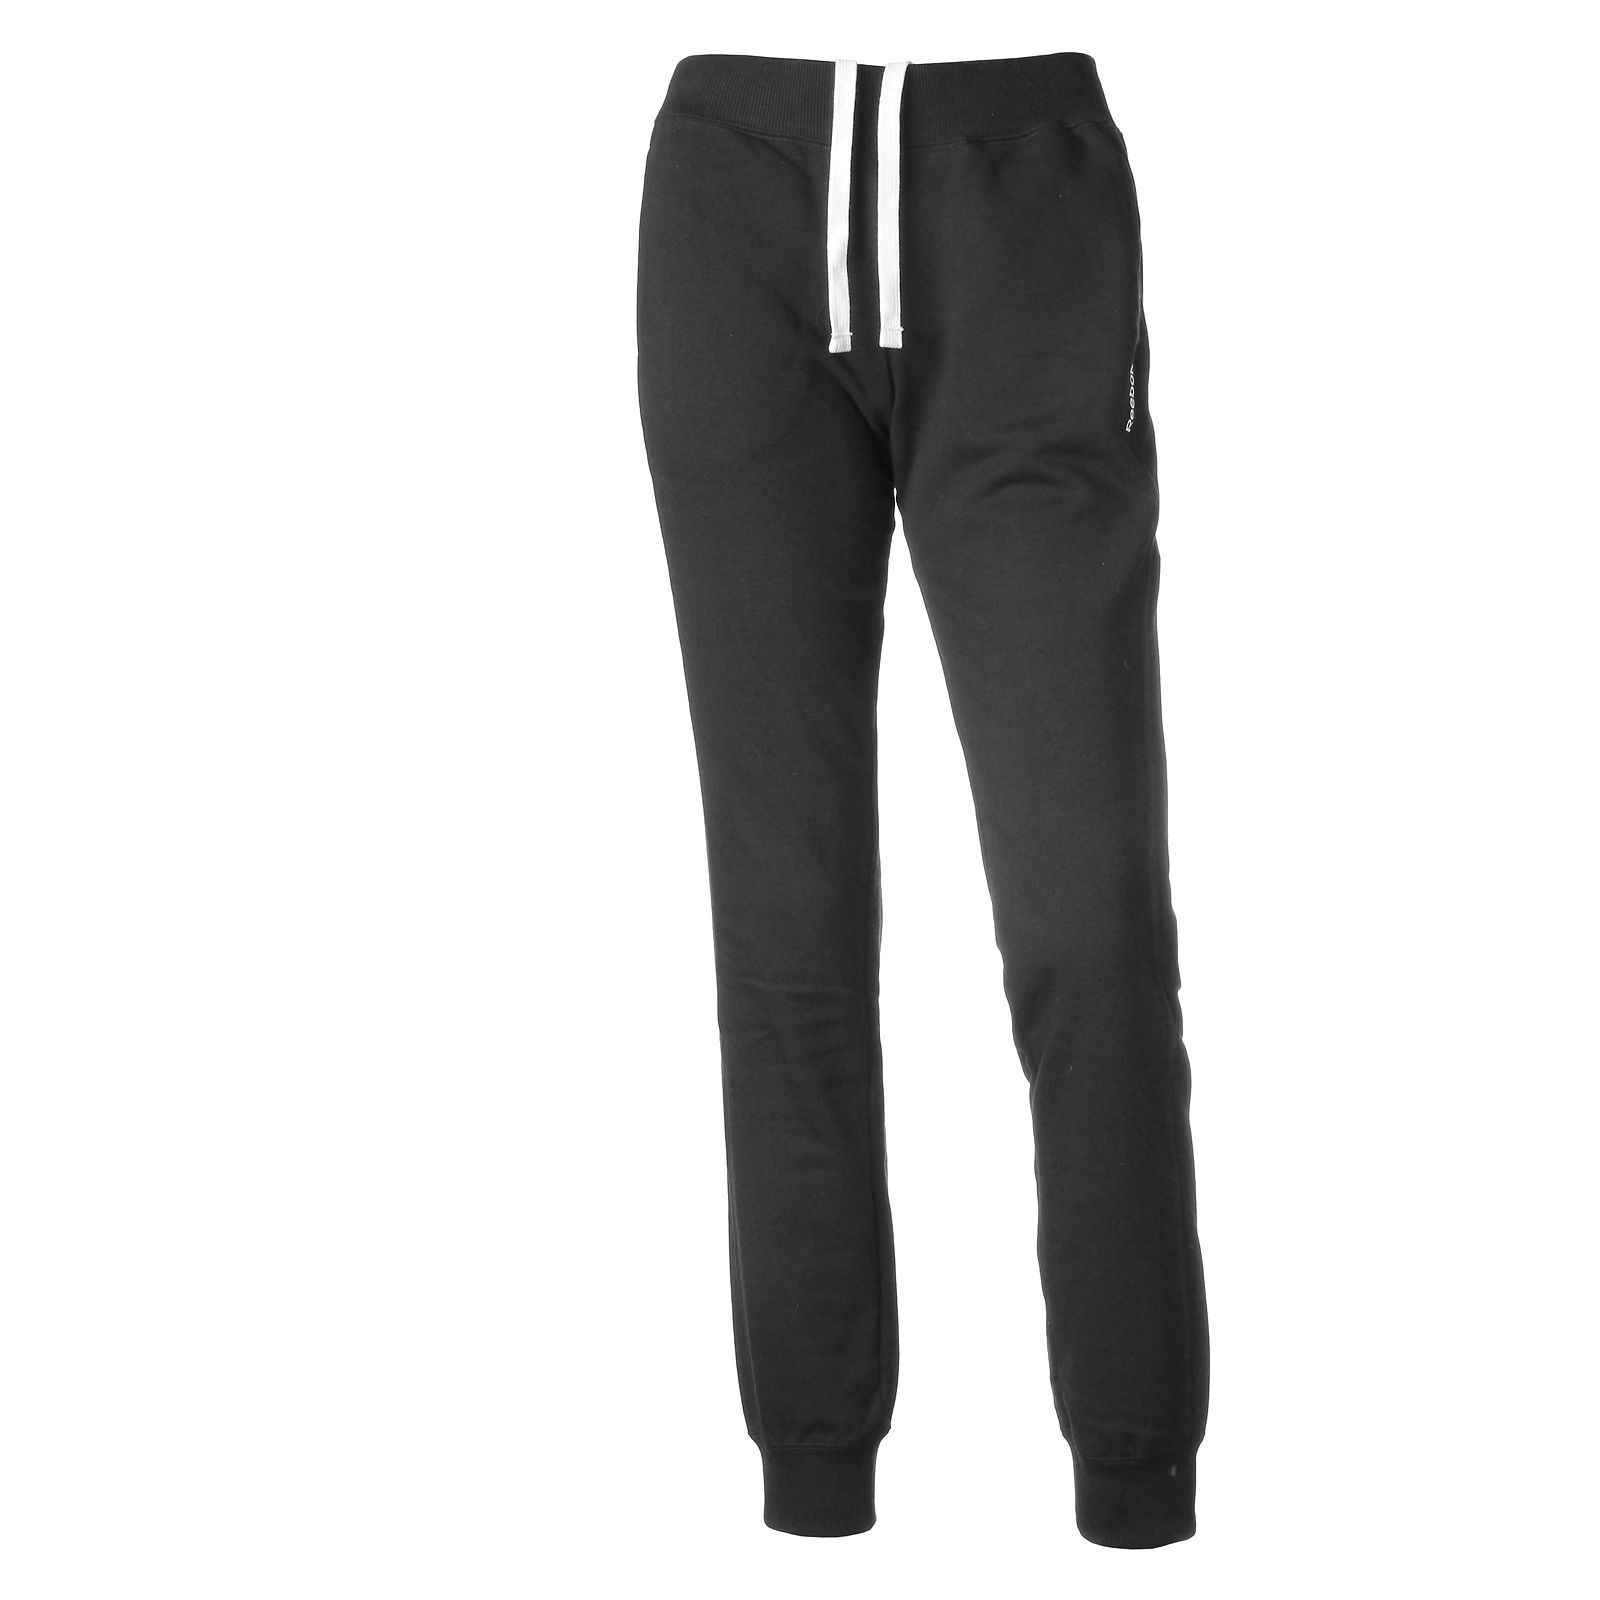 Spodnie Reebok Elements Cuffed W AA4545